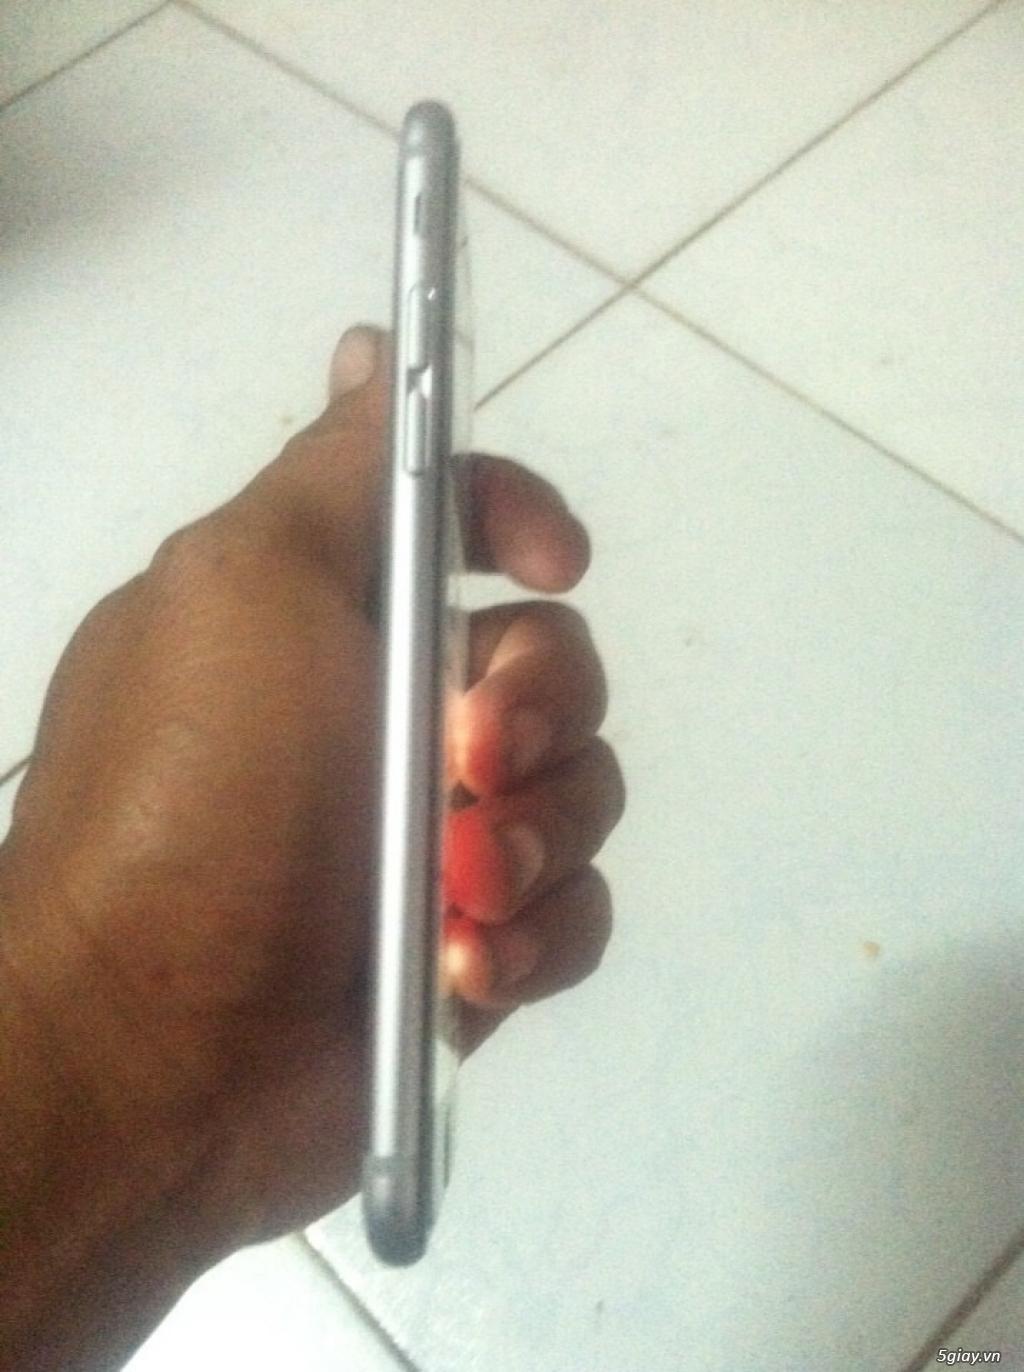 Ip6 16gb grey lock t-mobile 98% - 1